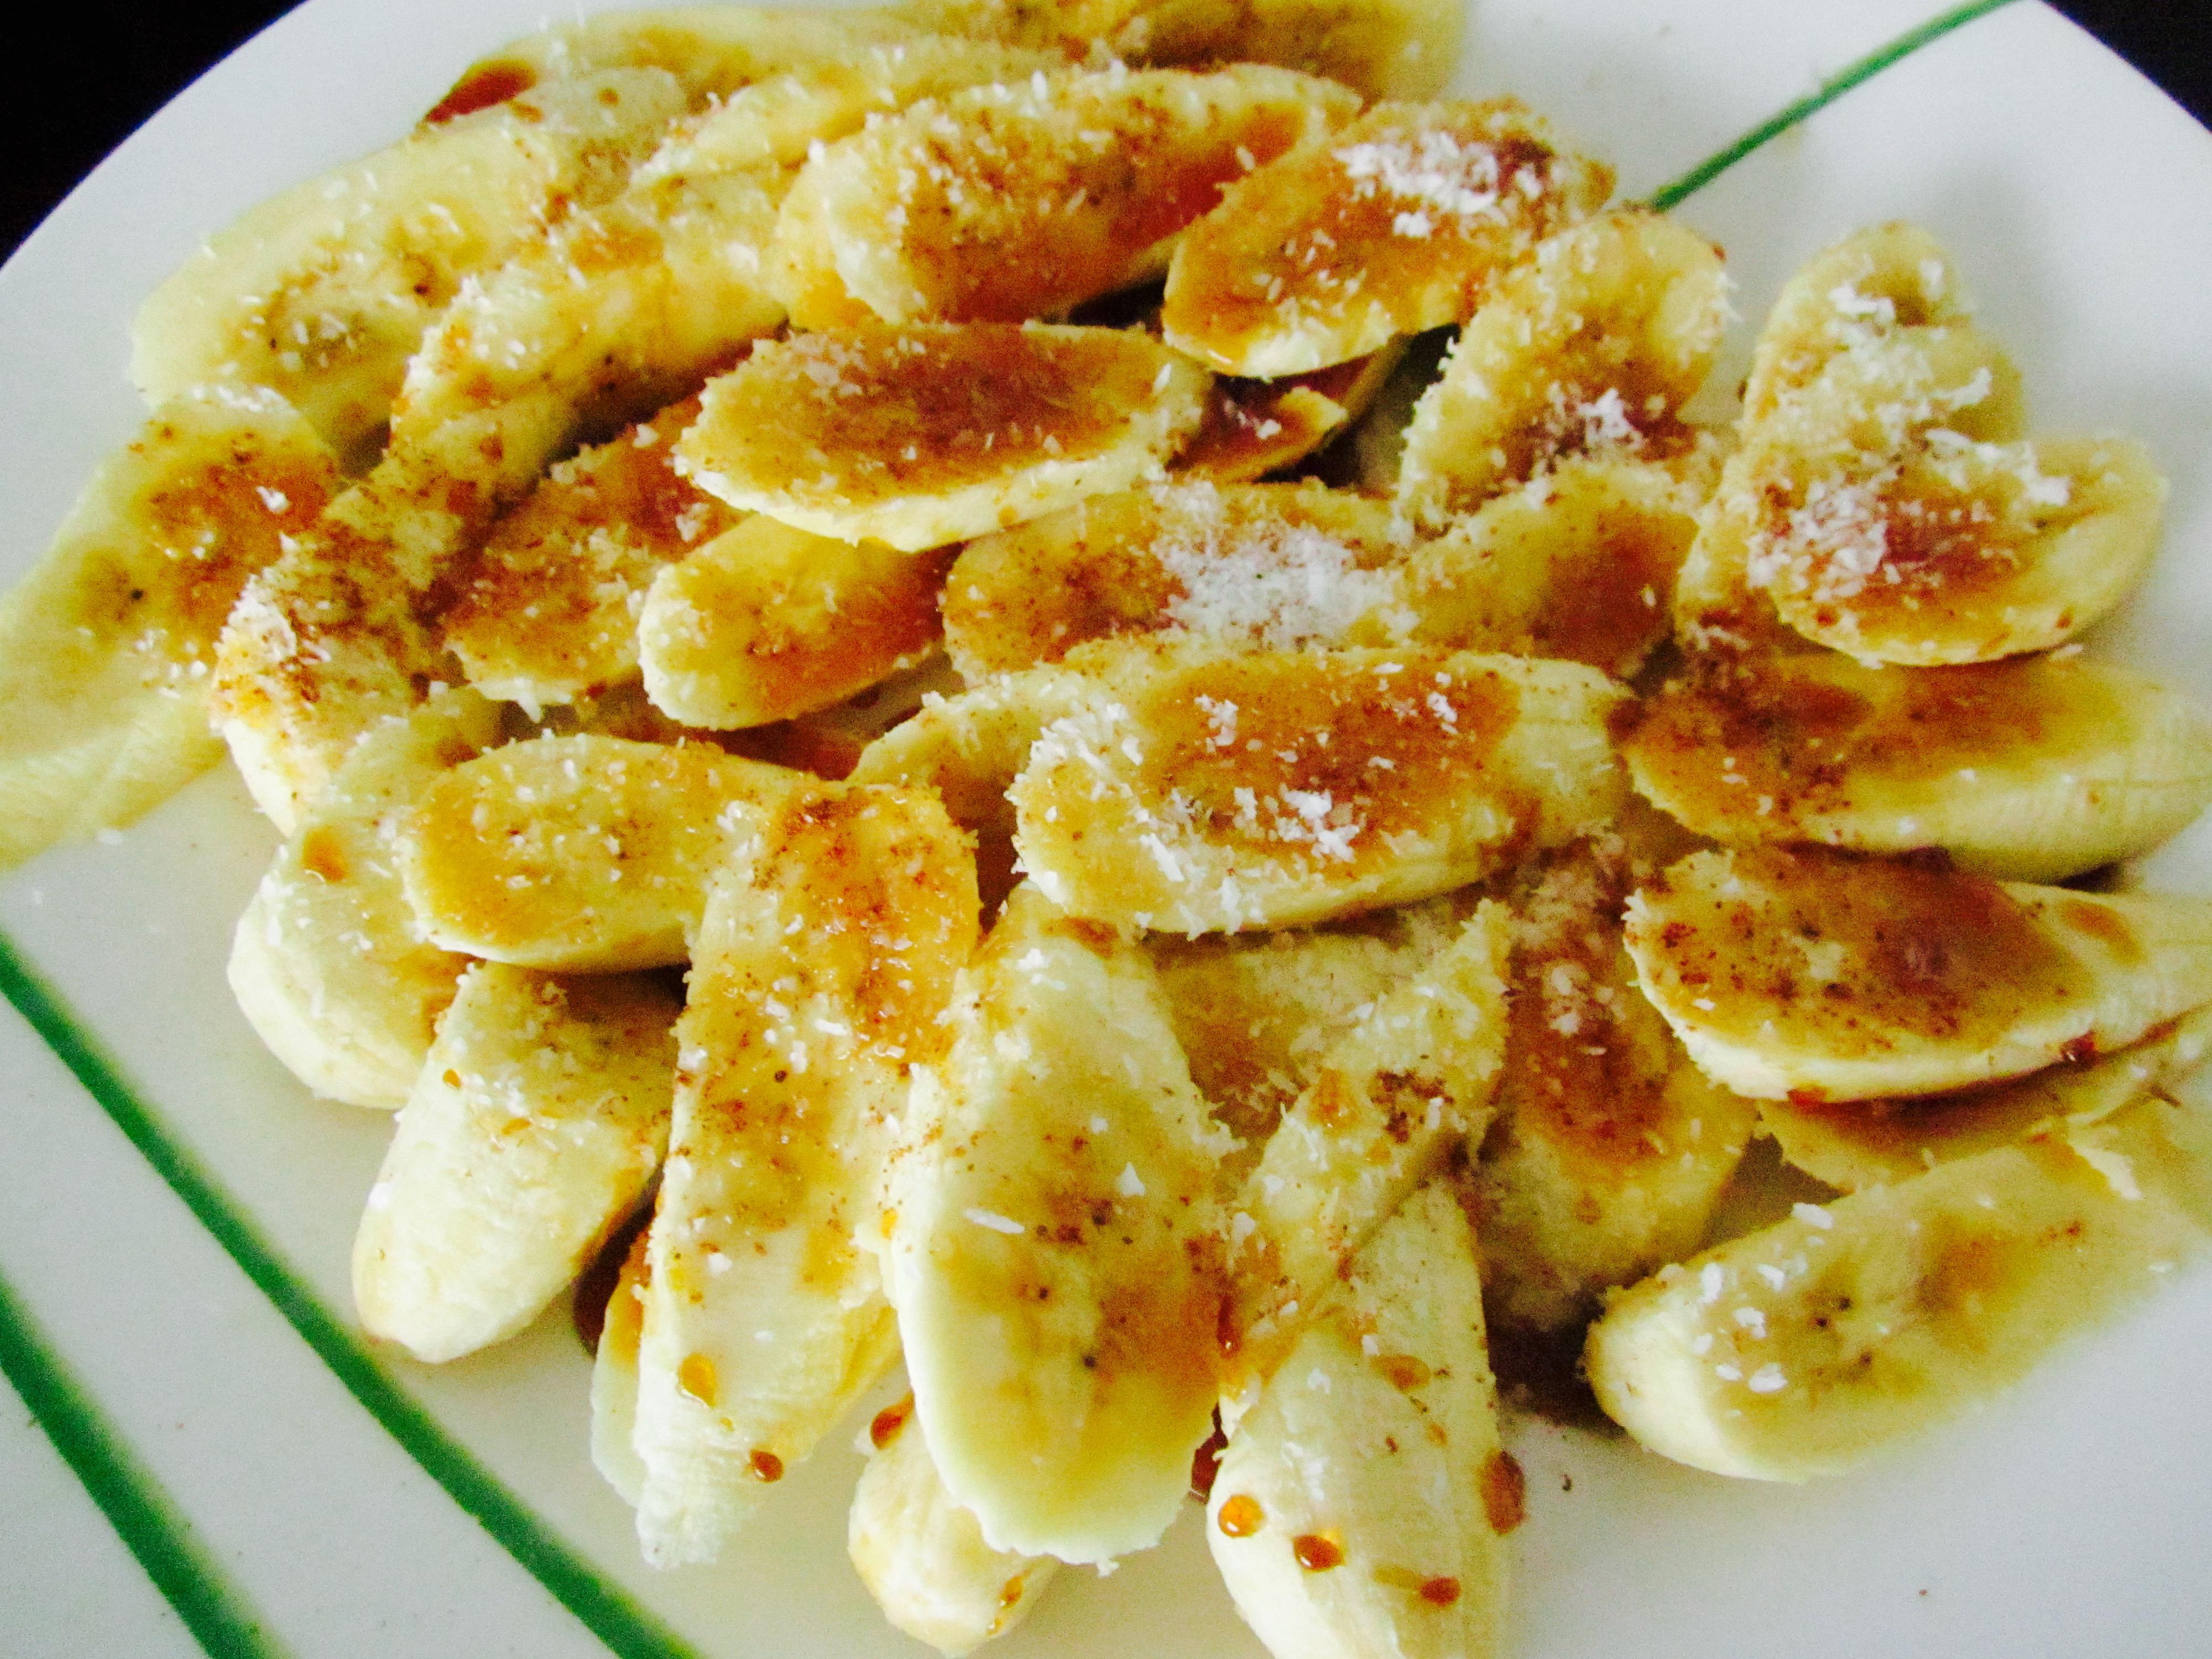 raw-banana-dessert-gluten-fre